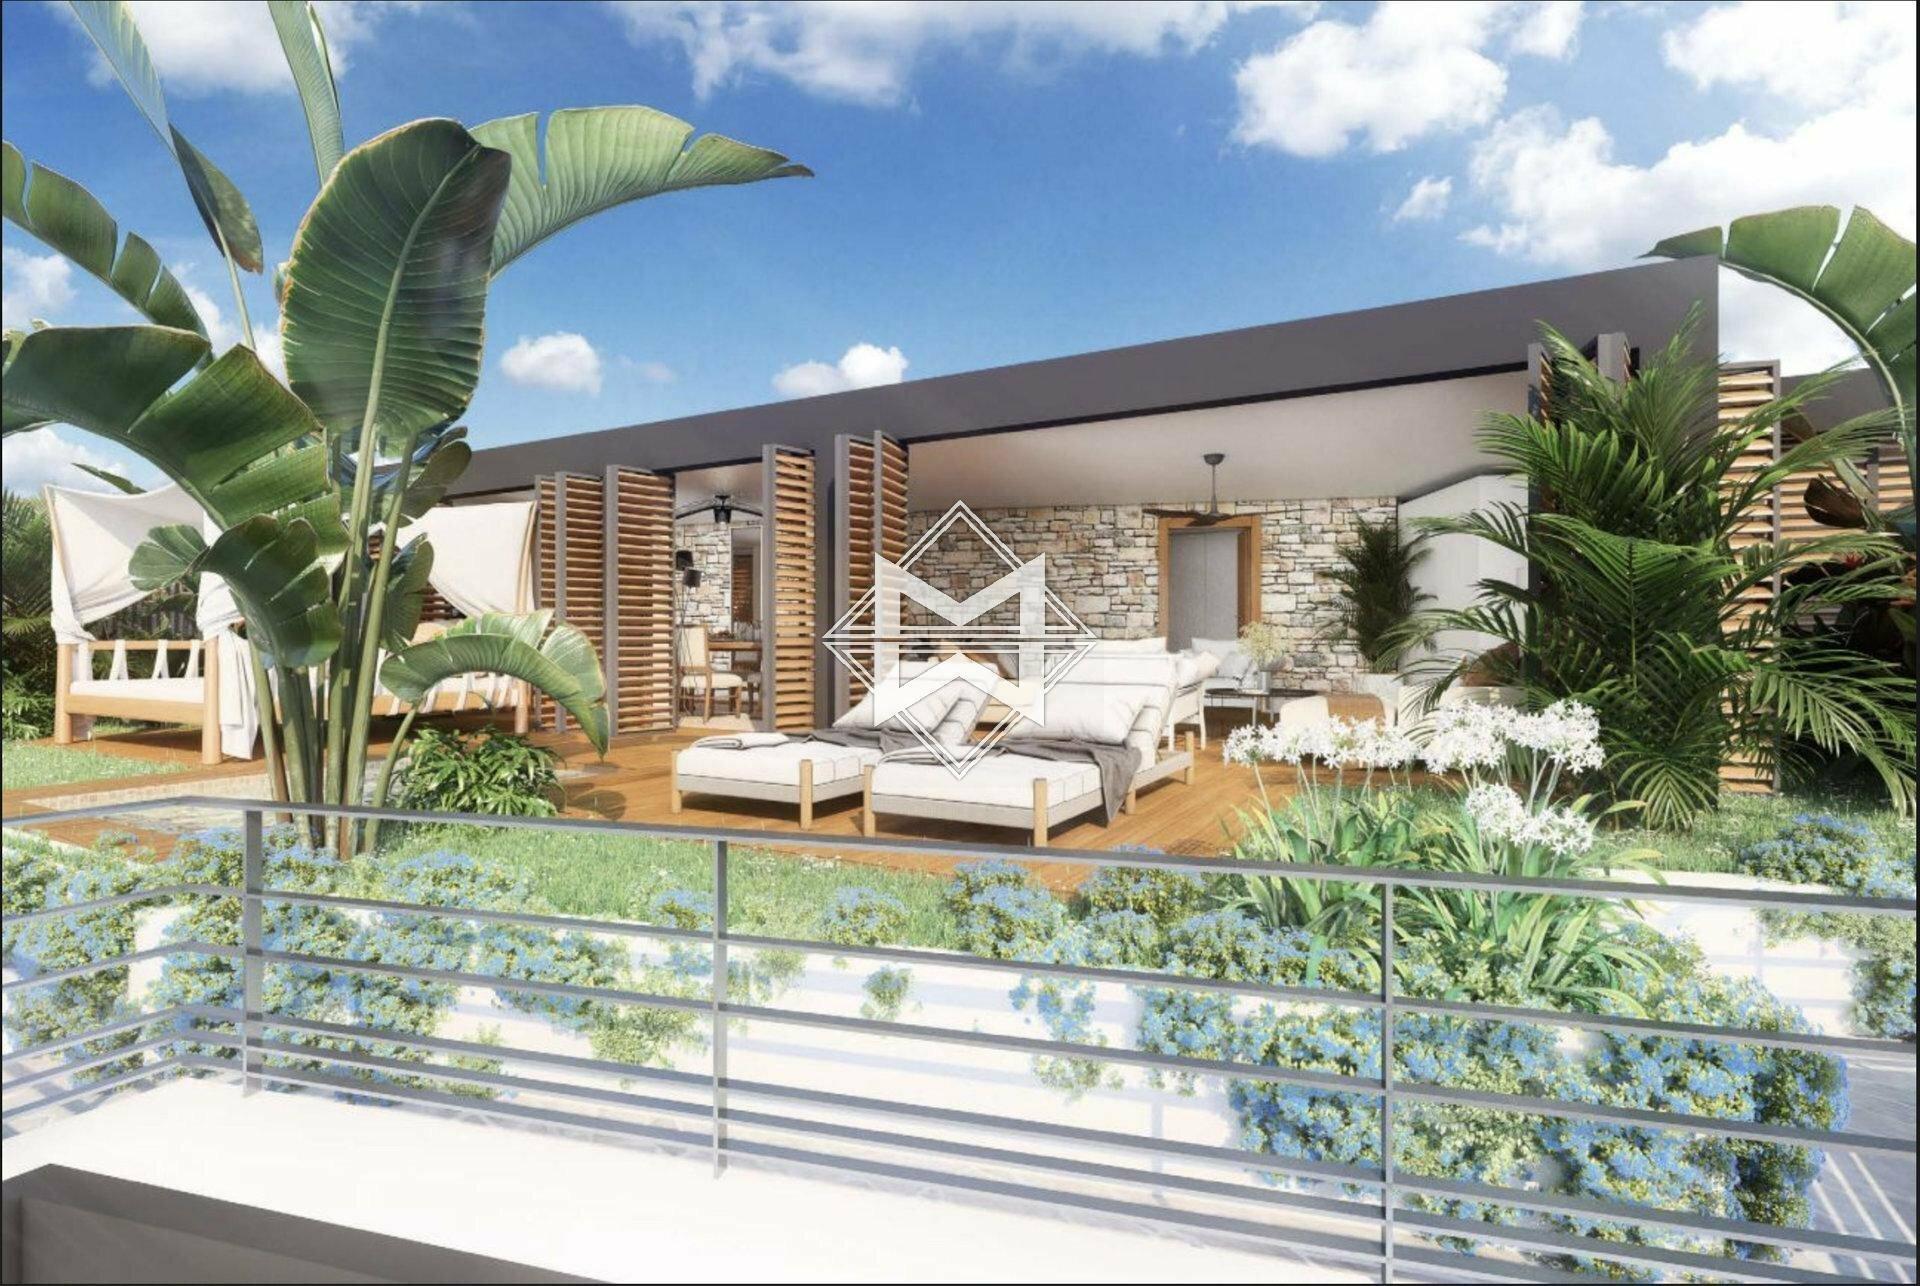 Apartment in Cannes, Provence-Alpes-Côte d'Azur, France 1 - 11241332